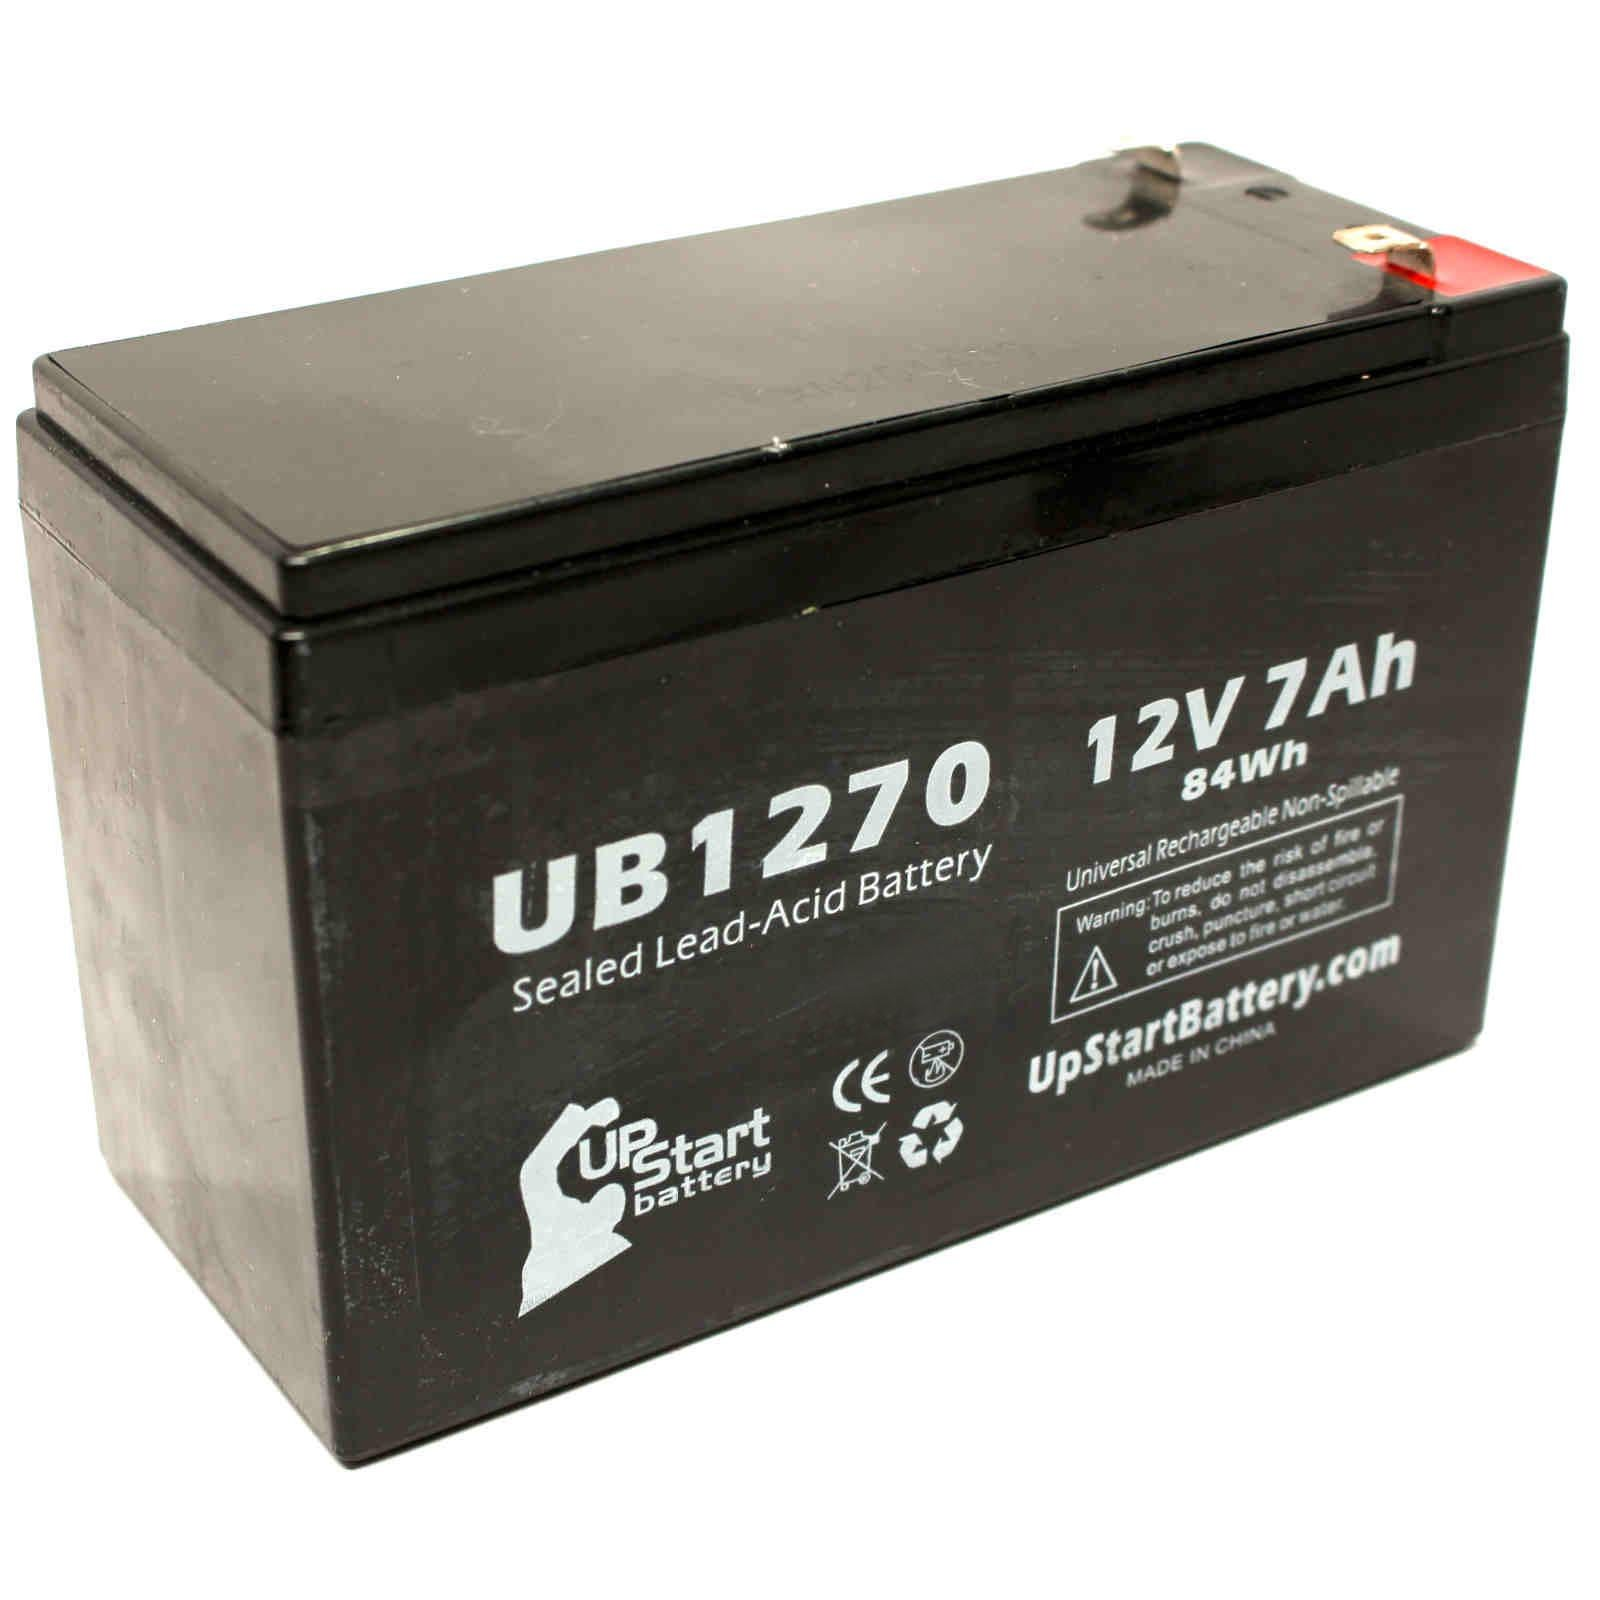 4x Pack - APC SMART-UPS 1500VA USB & SER SUA1500RMUS Battery - Replacement UB1270 Universal Sealed Lead Acid Battery (12V, 7Ah, 7000mAh, F1 Terminal, AGM, SLA) - Includes 8 F1 to F2 Terminal Adapters by UpStart Battery (Image #2)